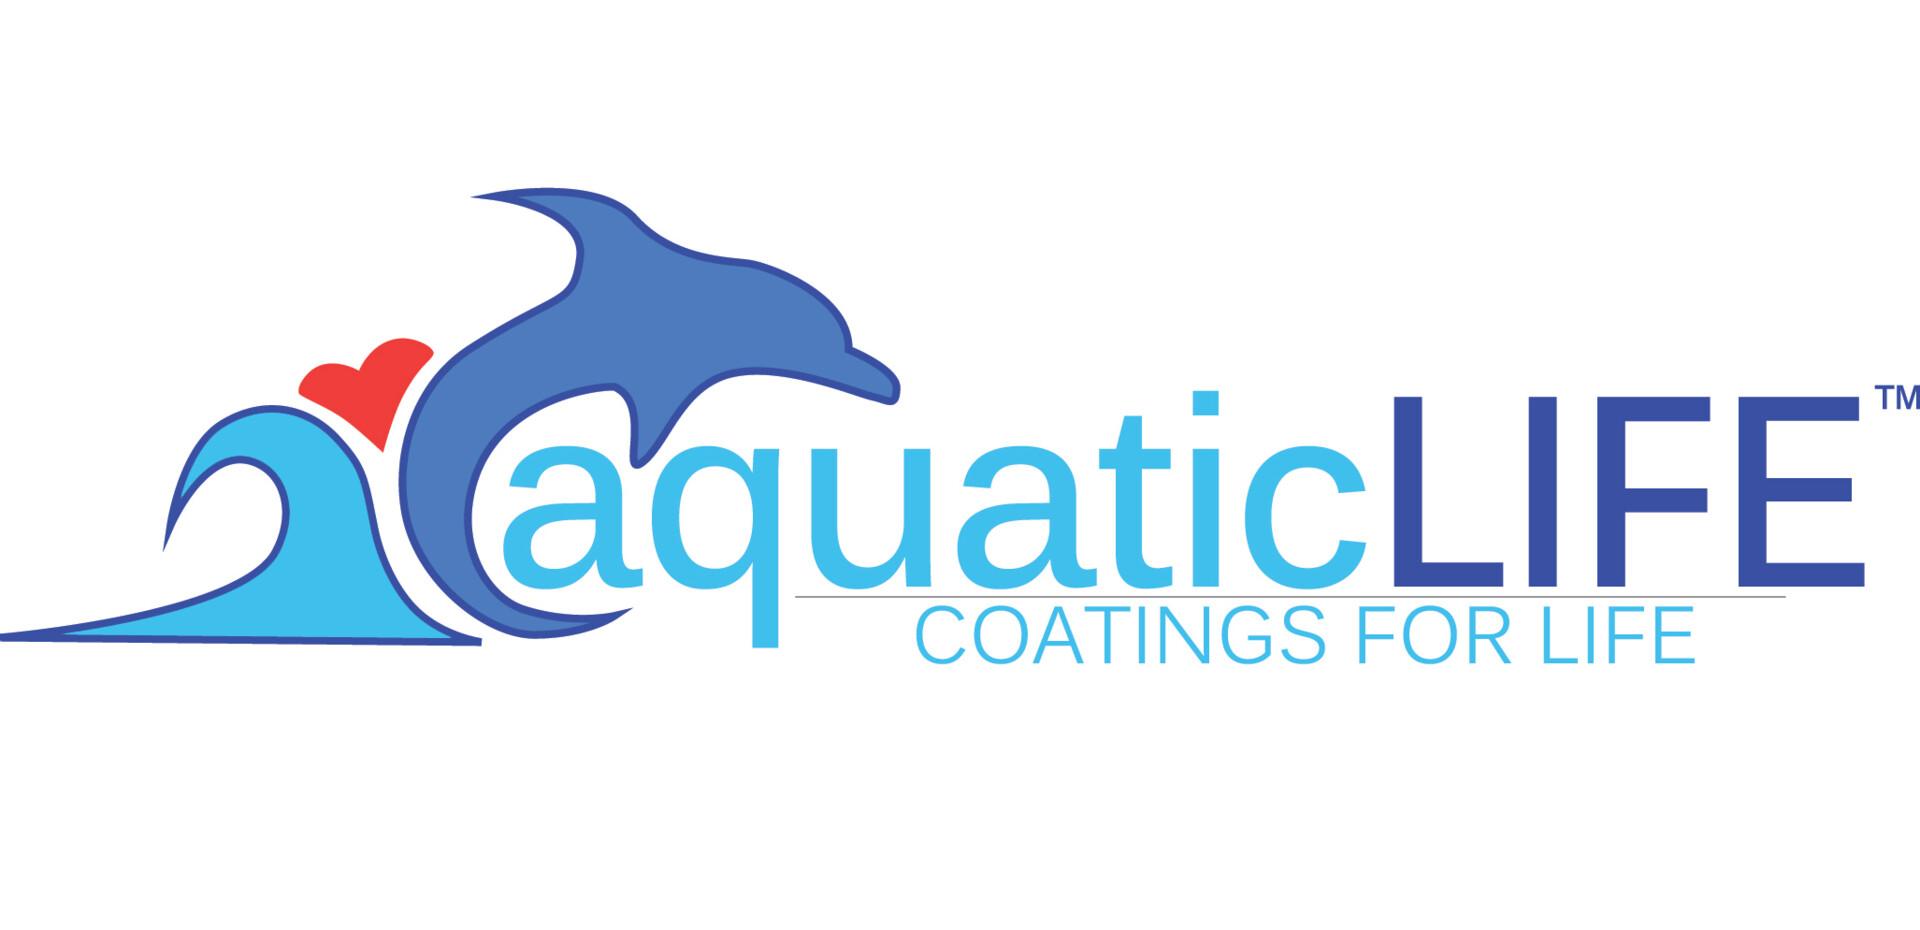 Kate miterko kate miterko aquaticlifecolor